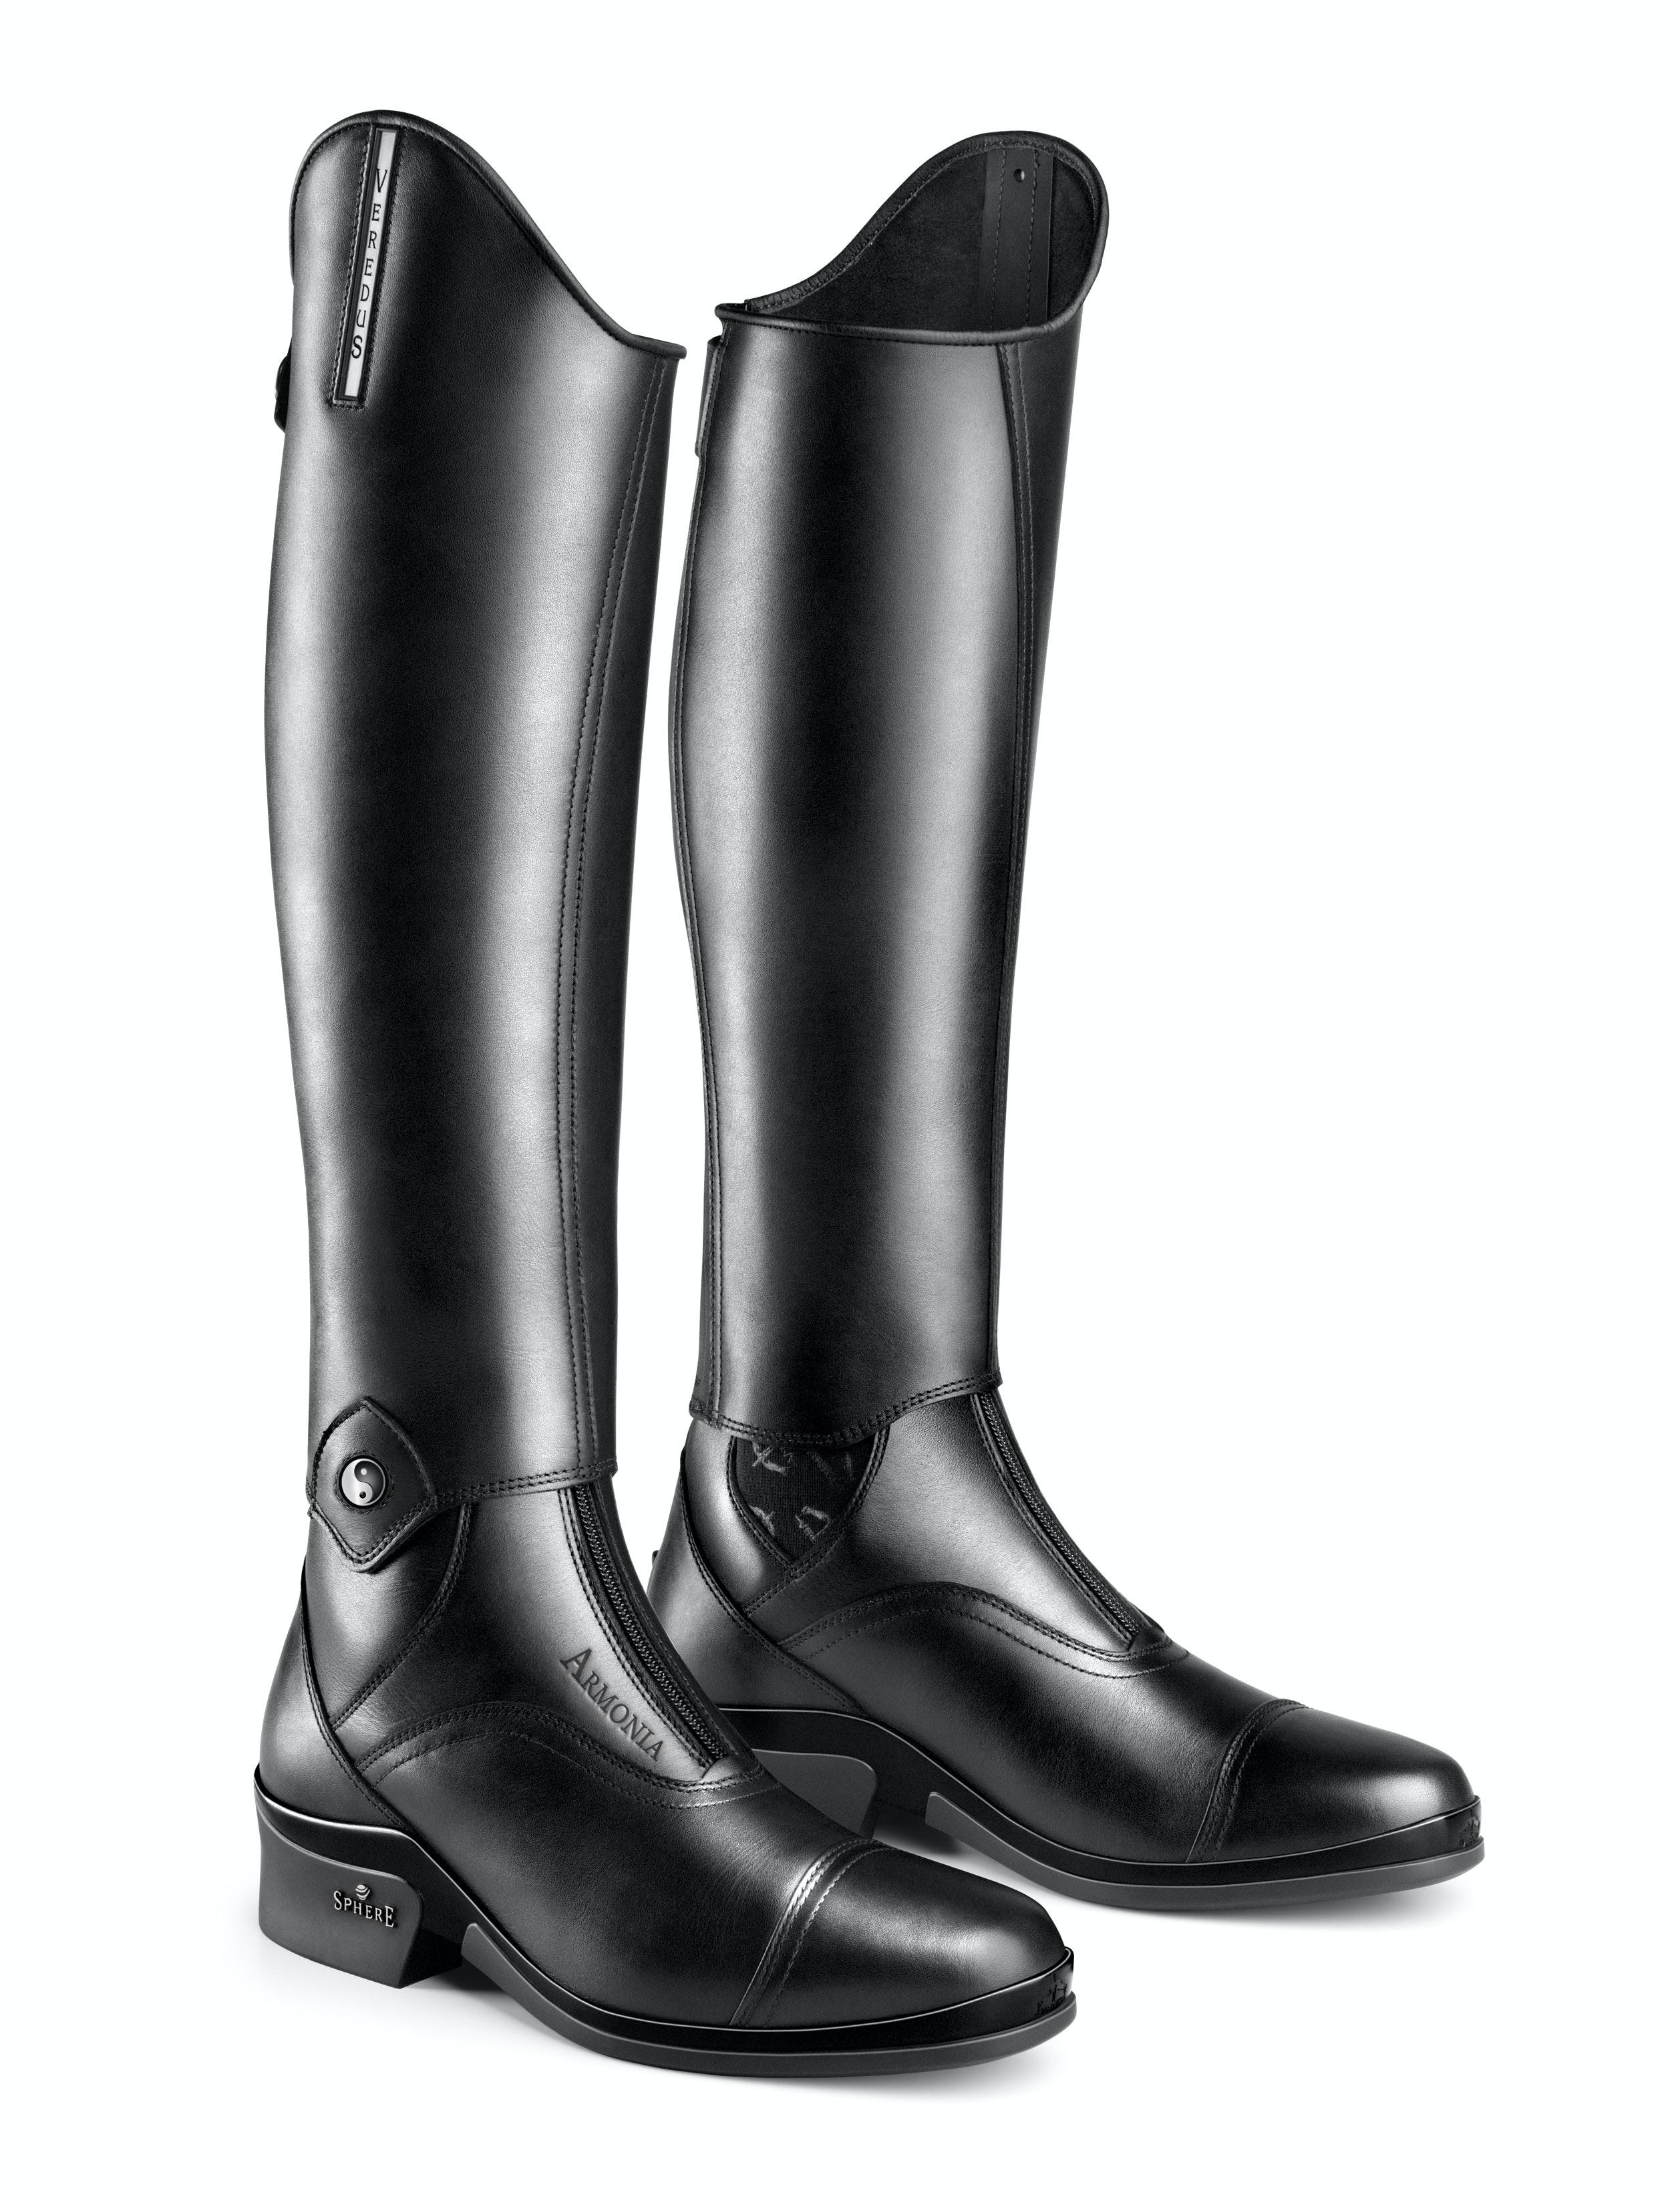 Ying yang boots armoniaaccordo pair front lr